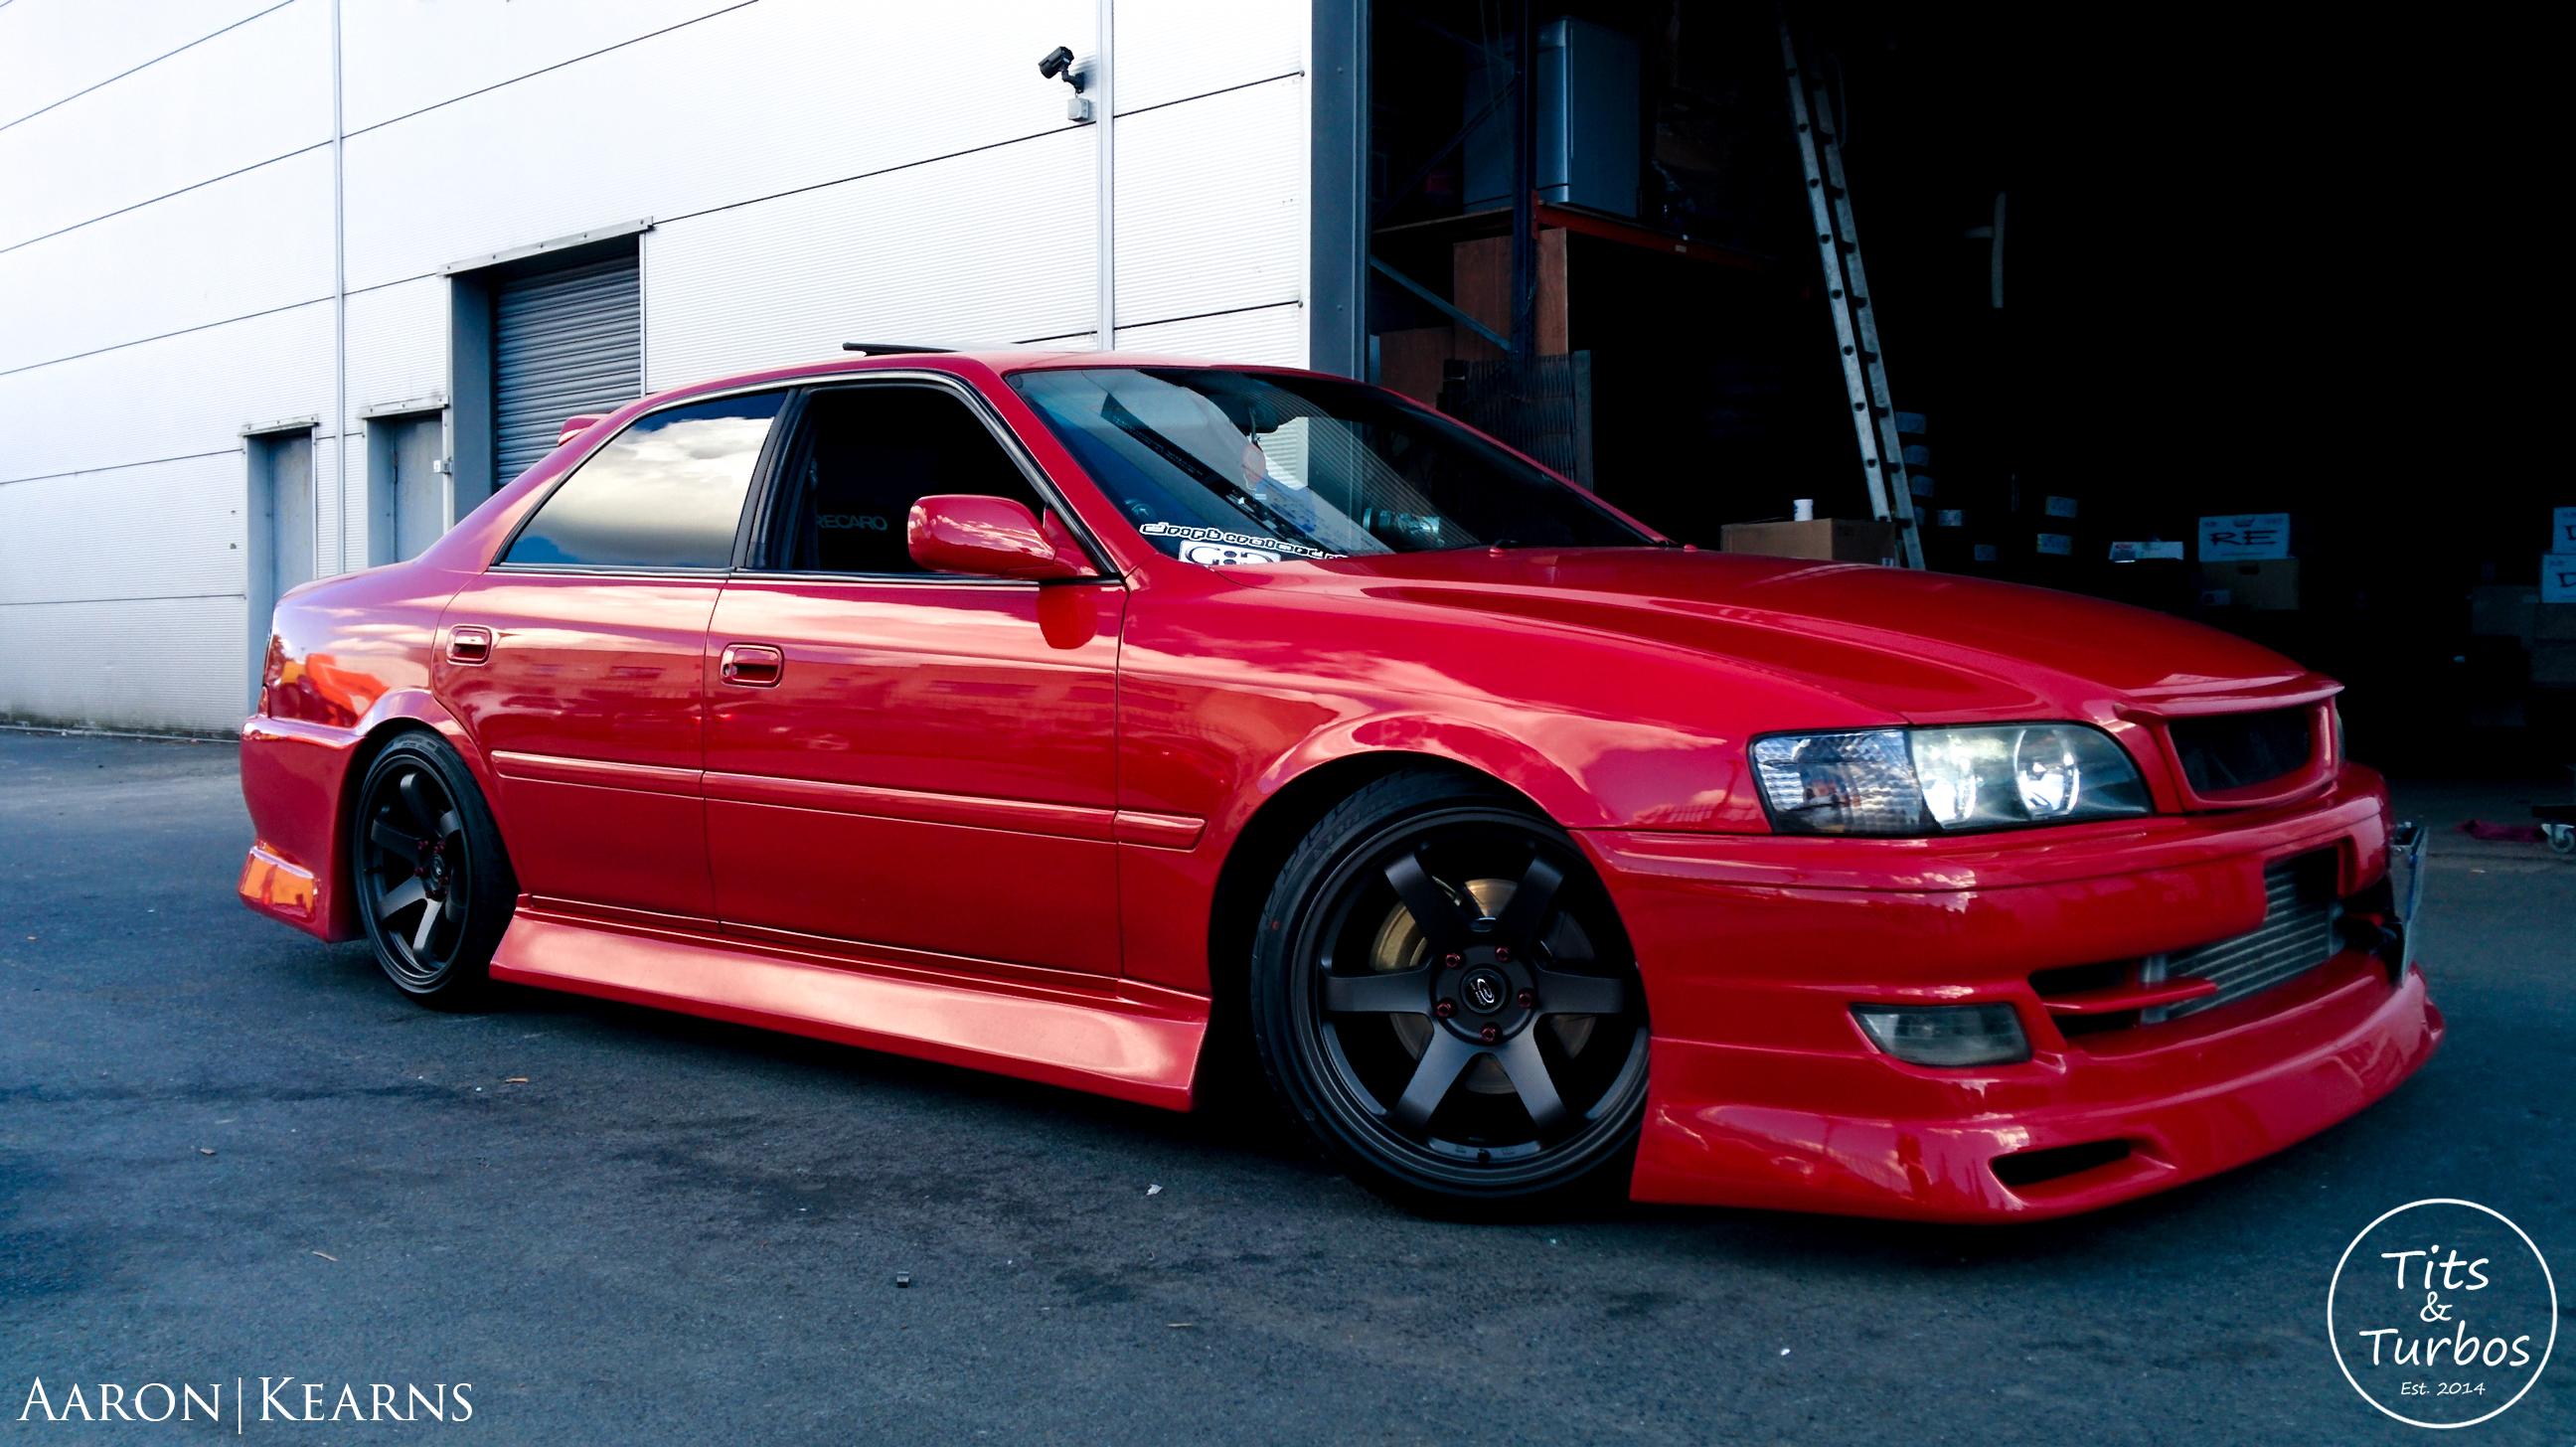 240sx Fairlady >> Zilvia.net Forums | Nissan 240SX (Silvia) and Z (Fairlady) Car Forum - View Single Post - Sedans ...